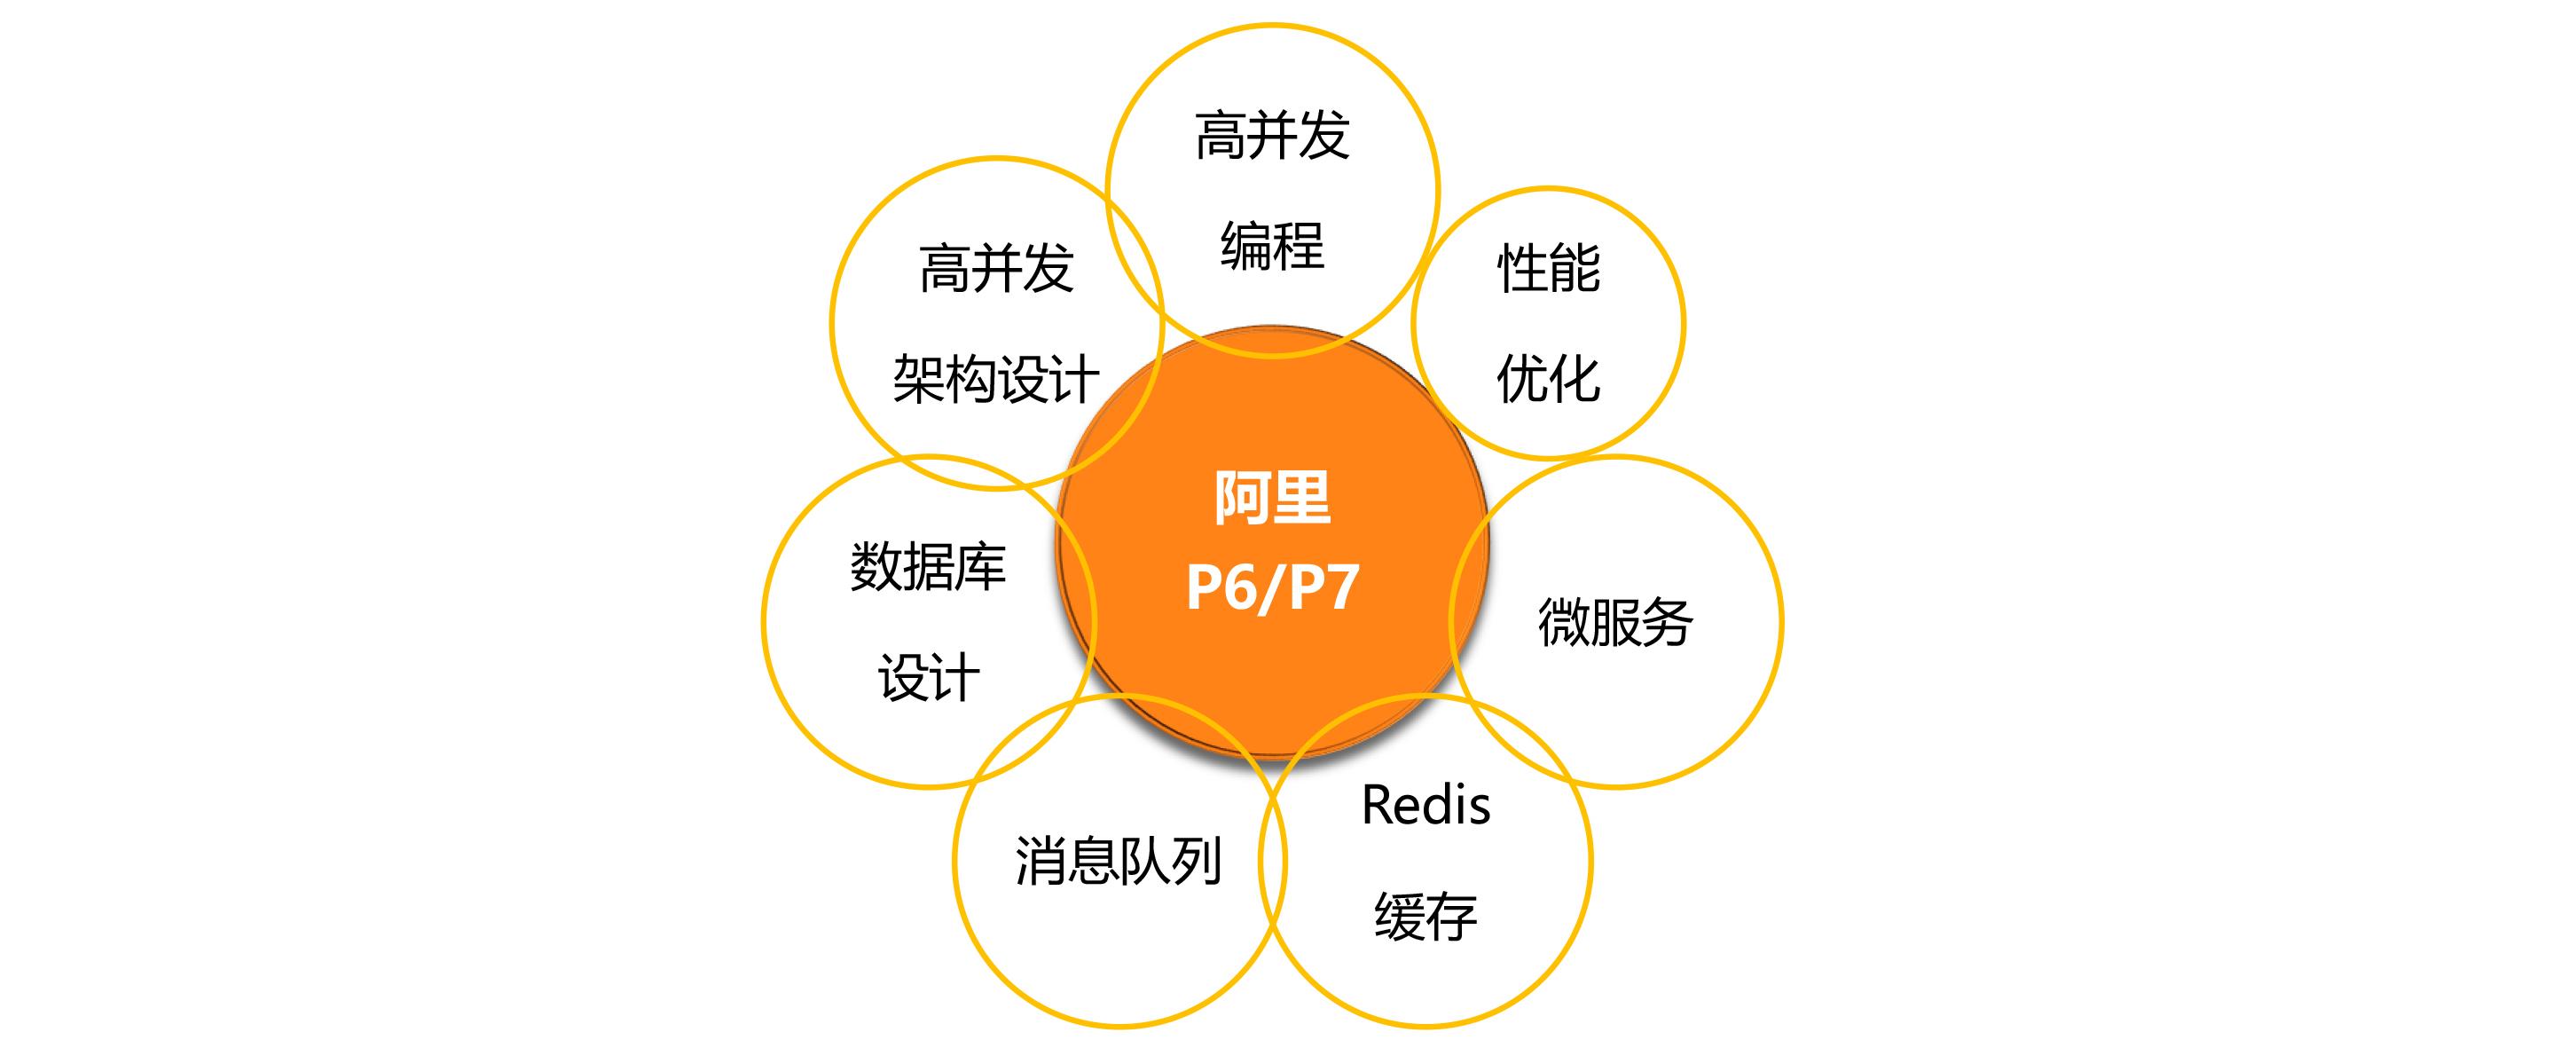 Java工程师,如何晋升为阿里P6/P7技术专家?